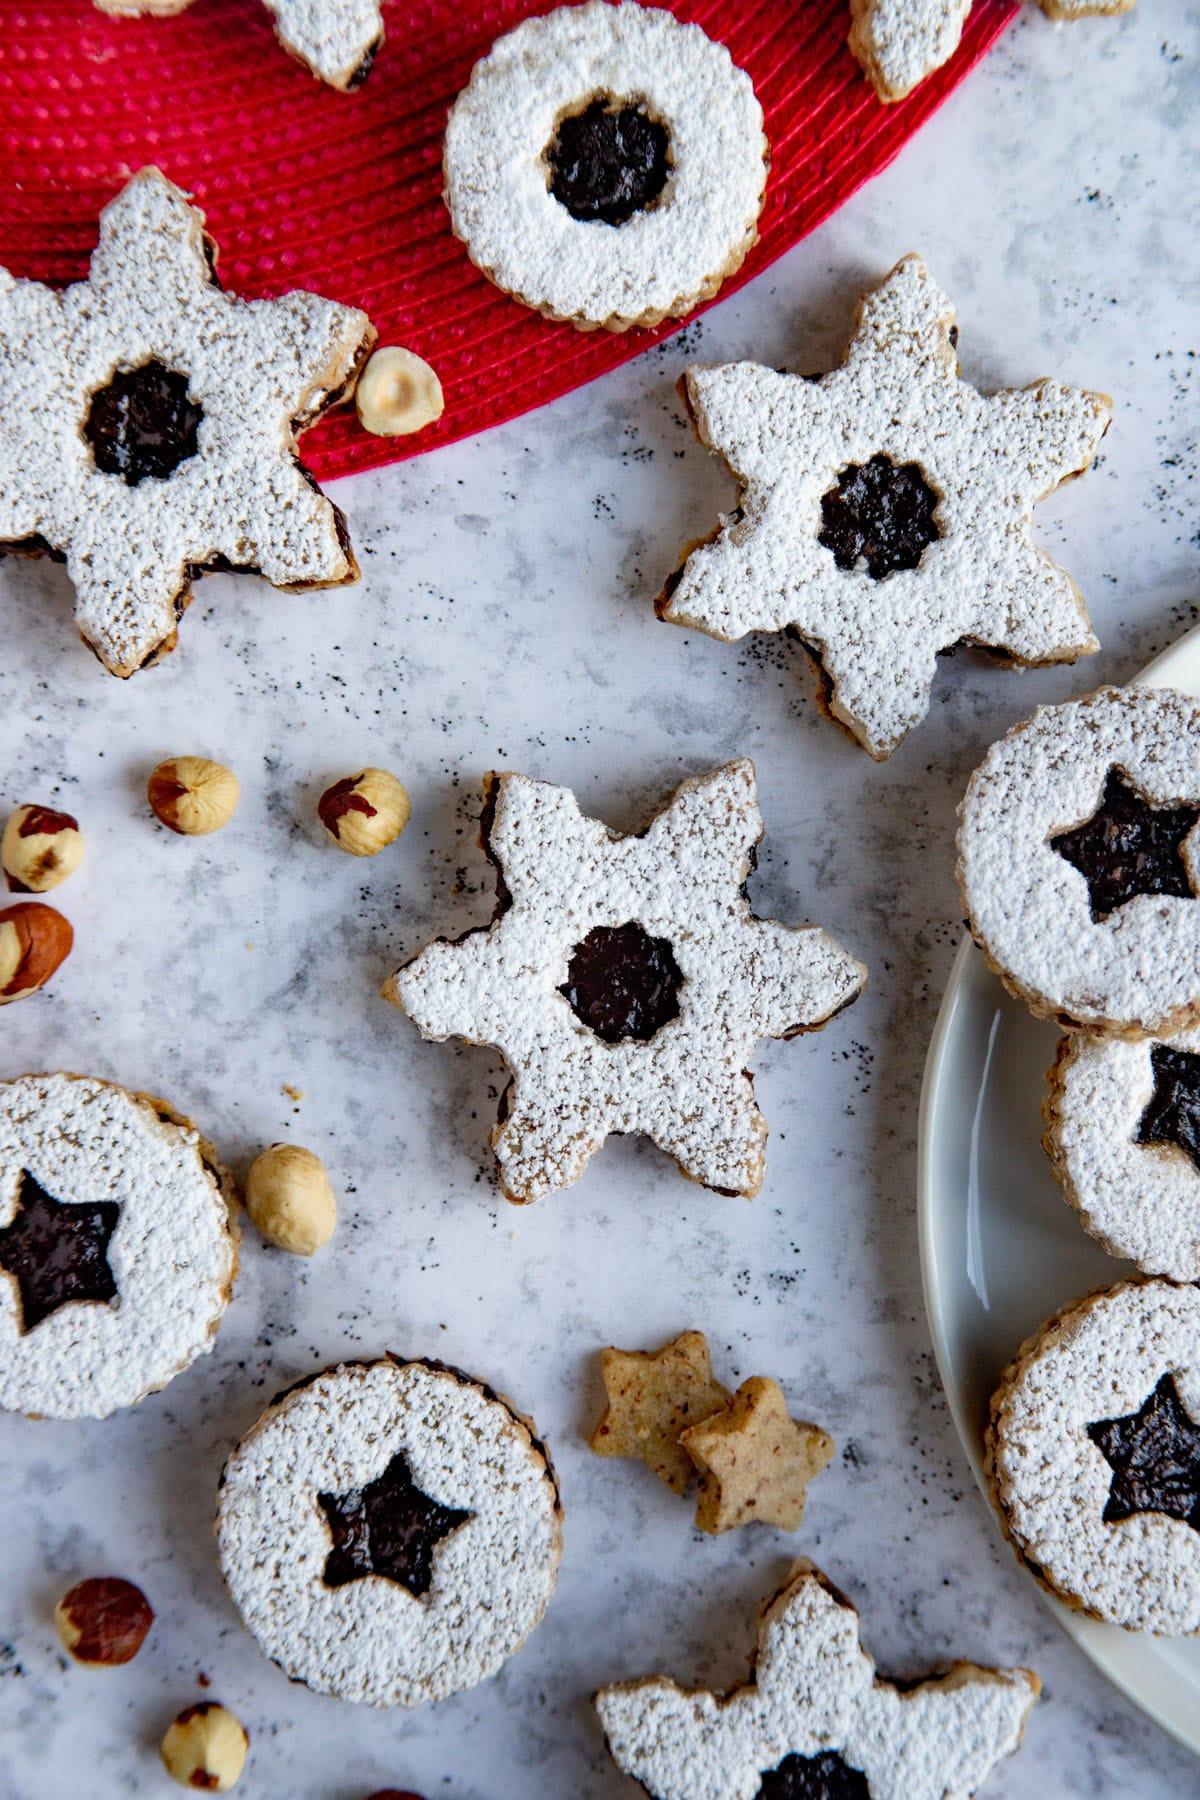 Hazelnut and Prune Jam Linzer Cookies with toasted hazelnuts